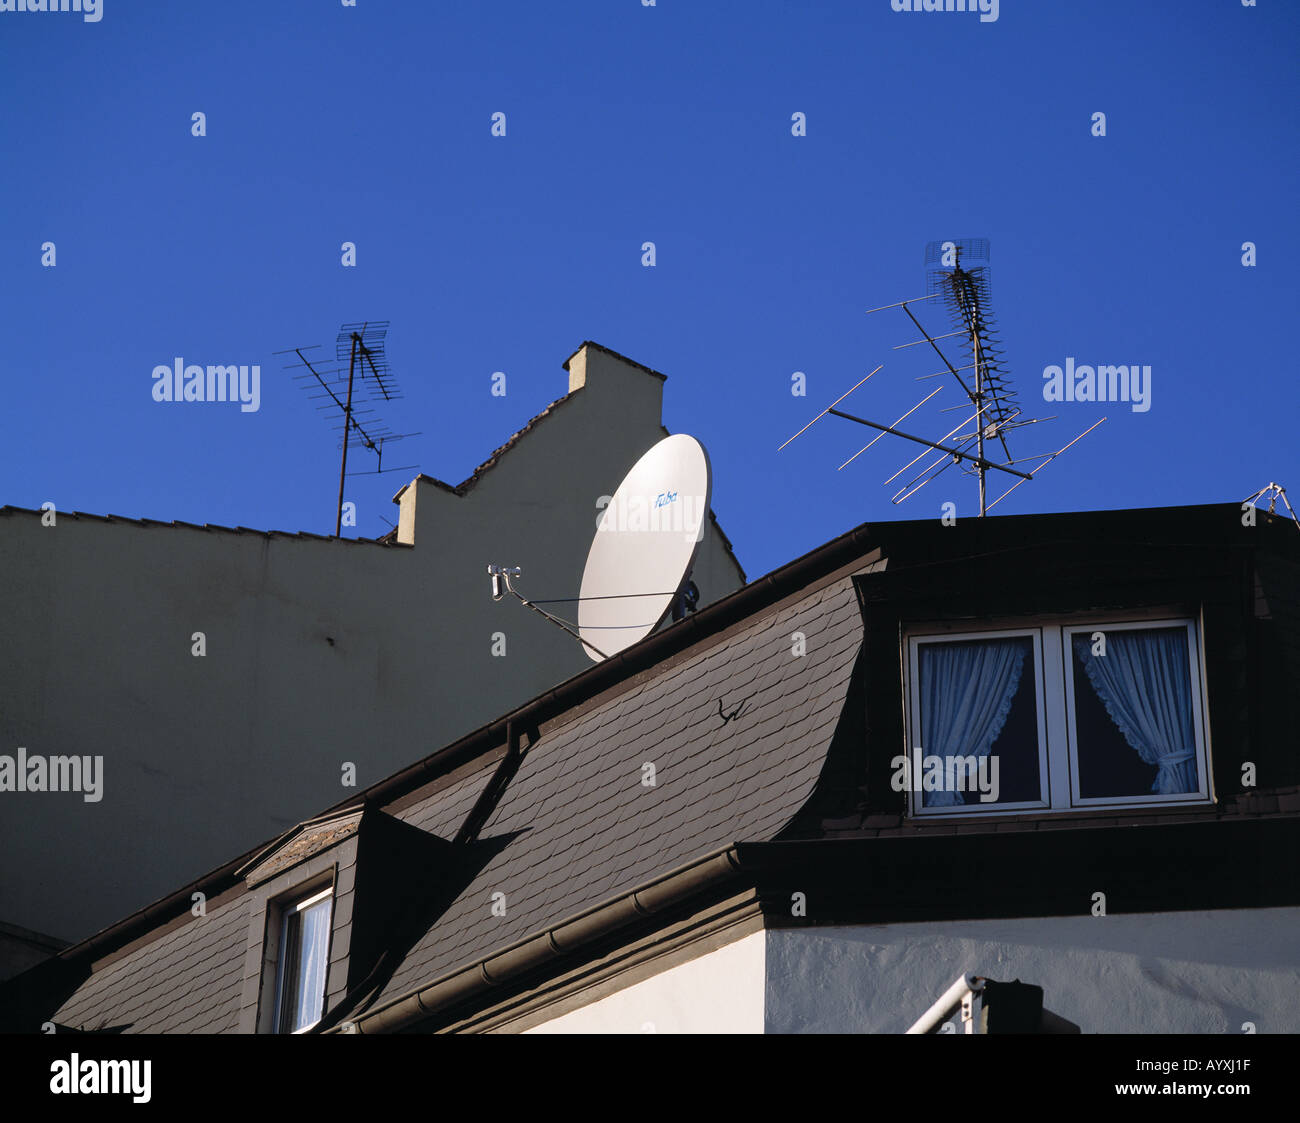 Parabolic Antenna And Customary Antennas On A House Roof, Digital And  Analogue, Analogous, Television, Radio, Radio Reception, Television Antenna,  TV Aerial ...